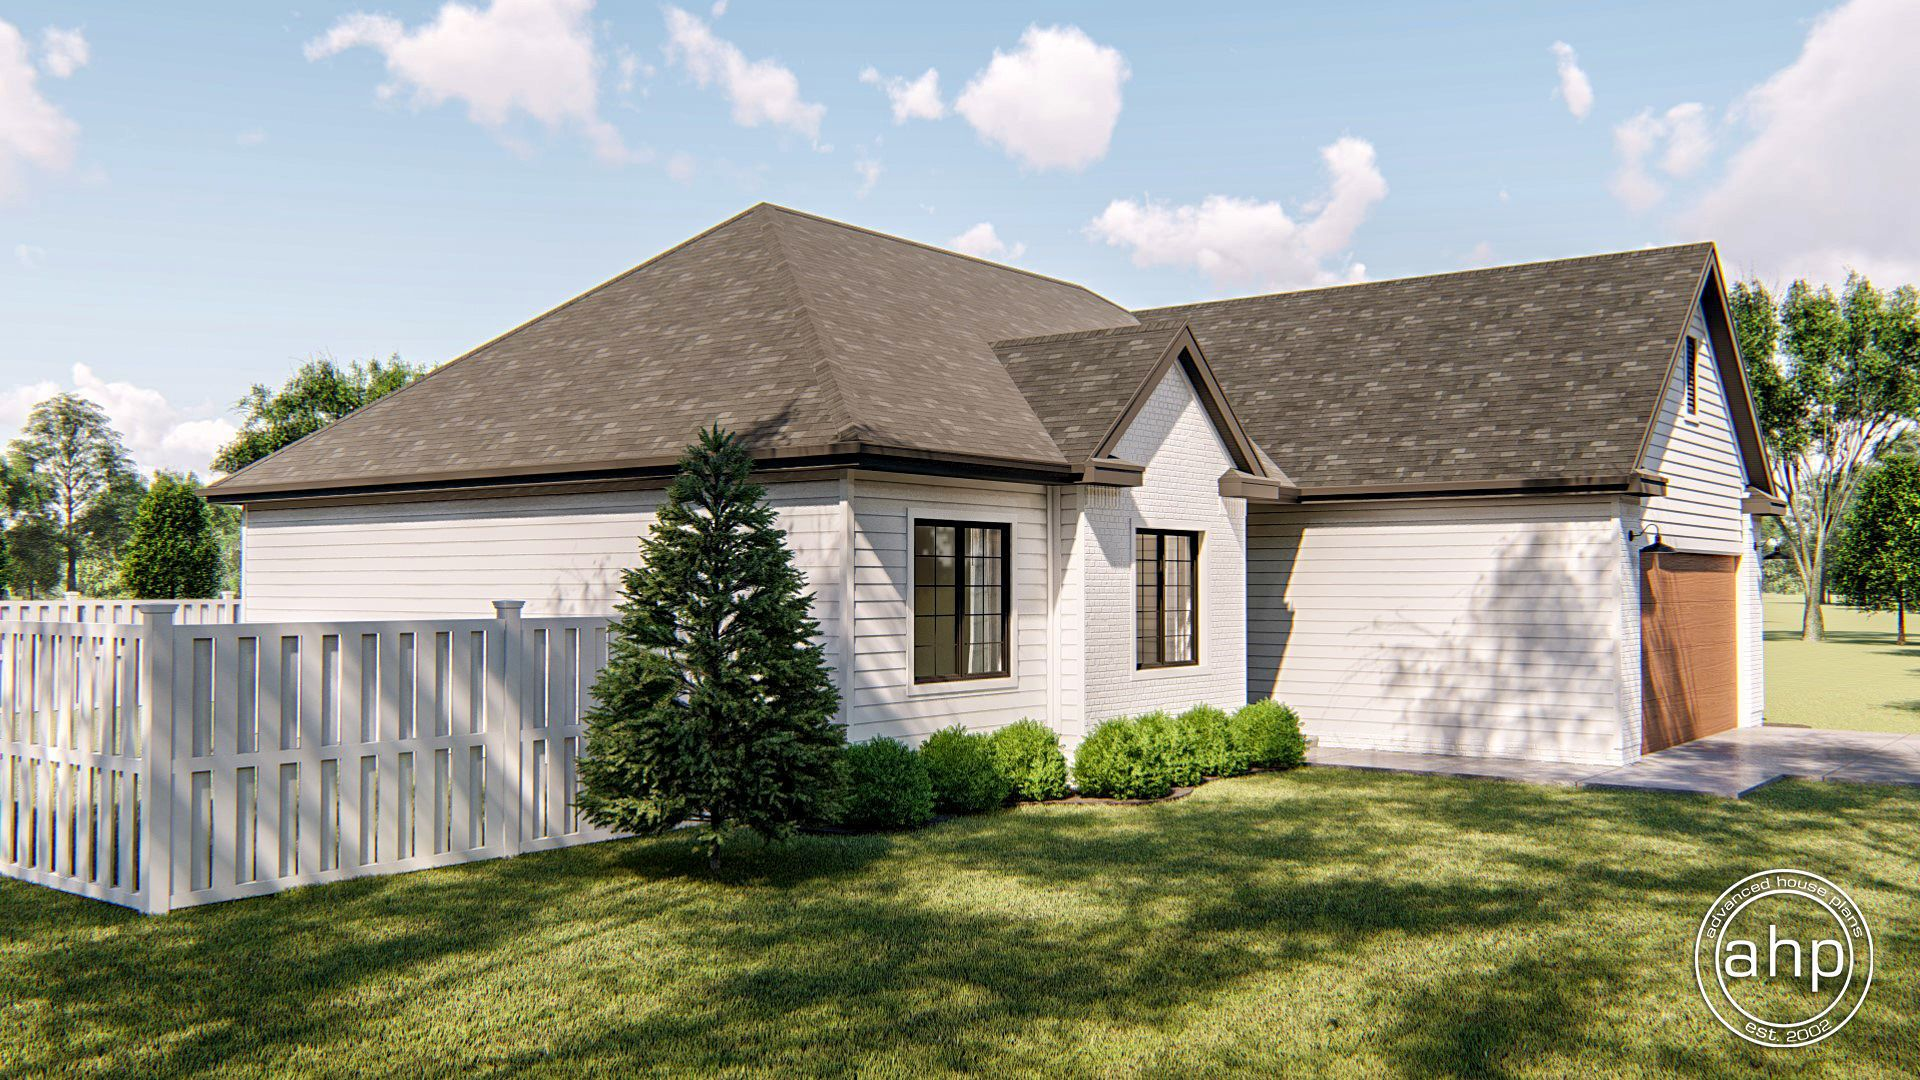 Sinclair 1 Story Modern Farmhouse House Plan House plans